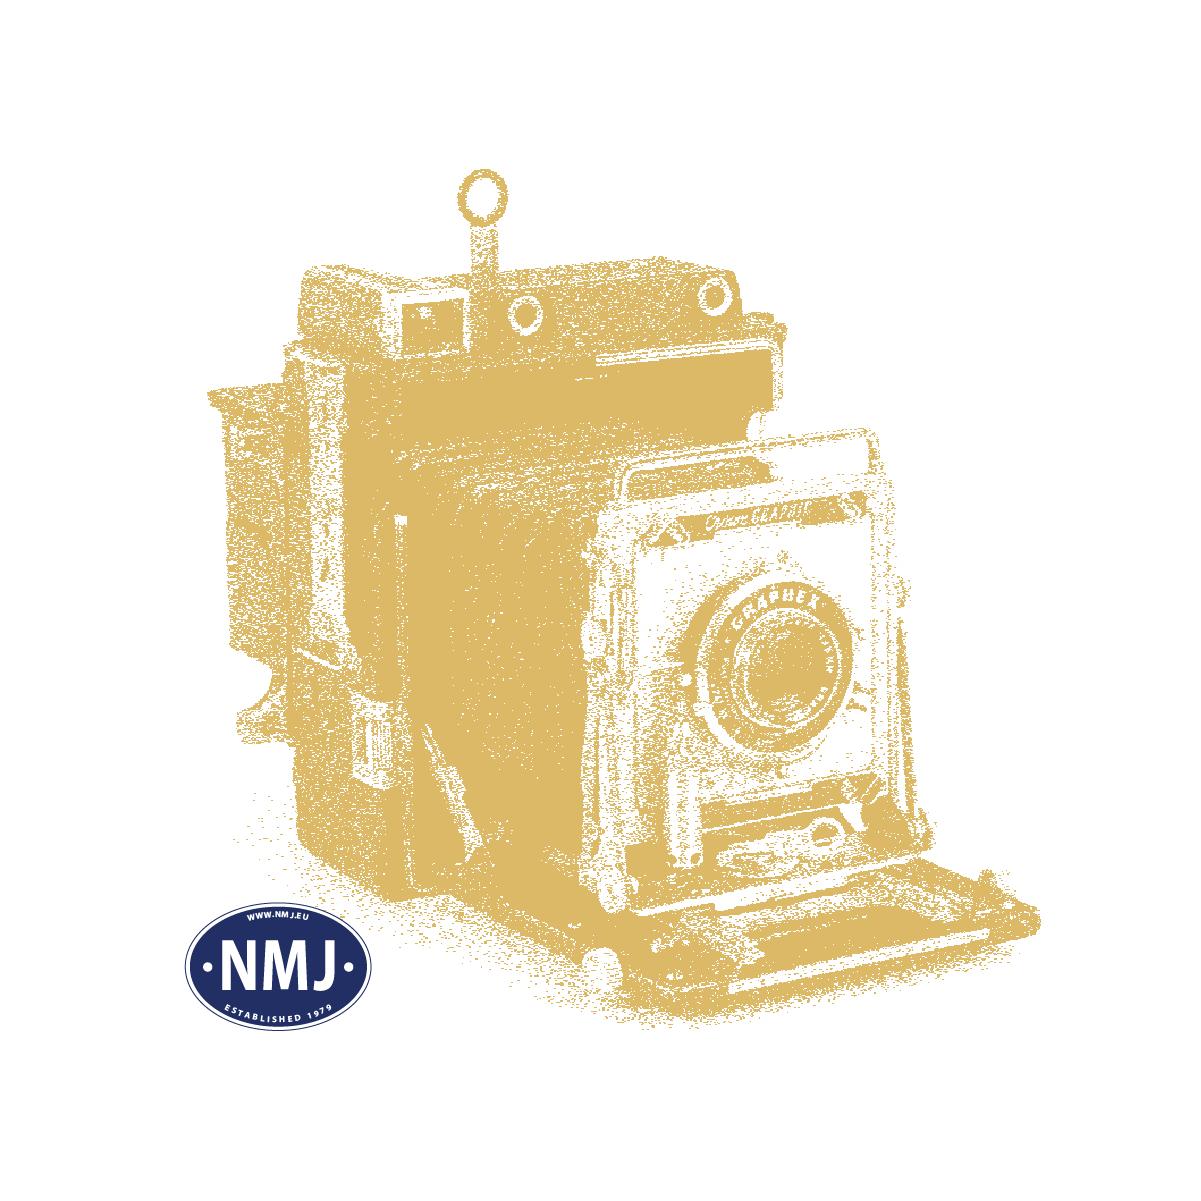 NMJSKAT16 - NMJ Superline Katalog 2016